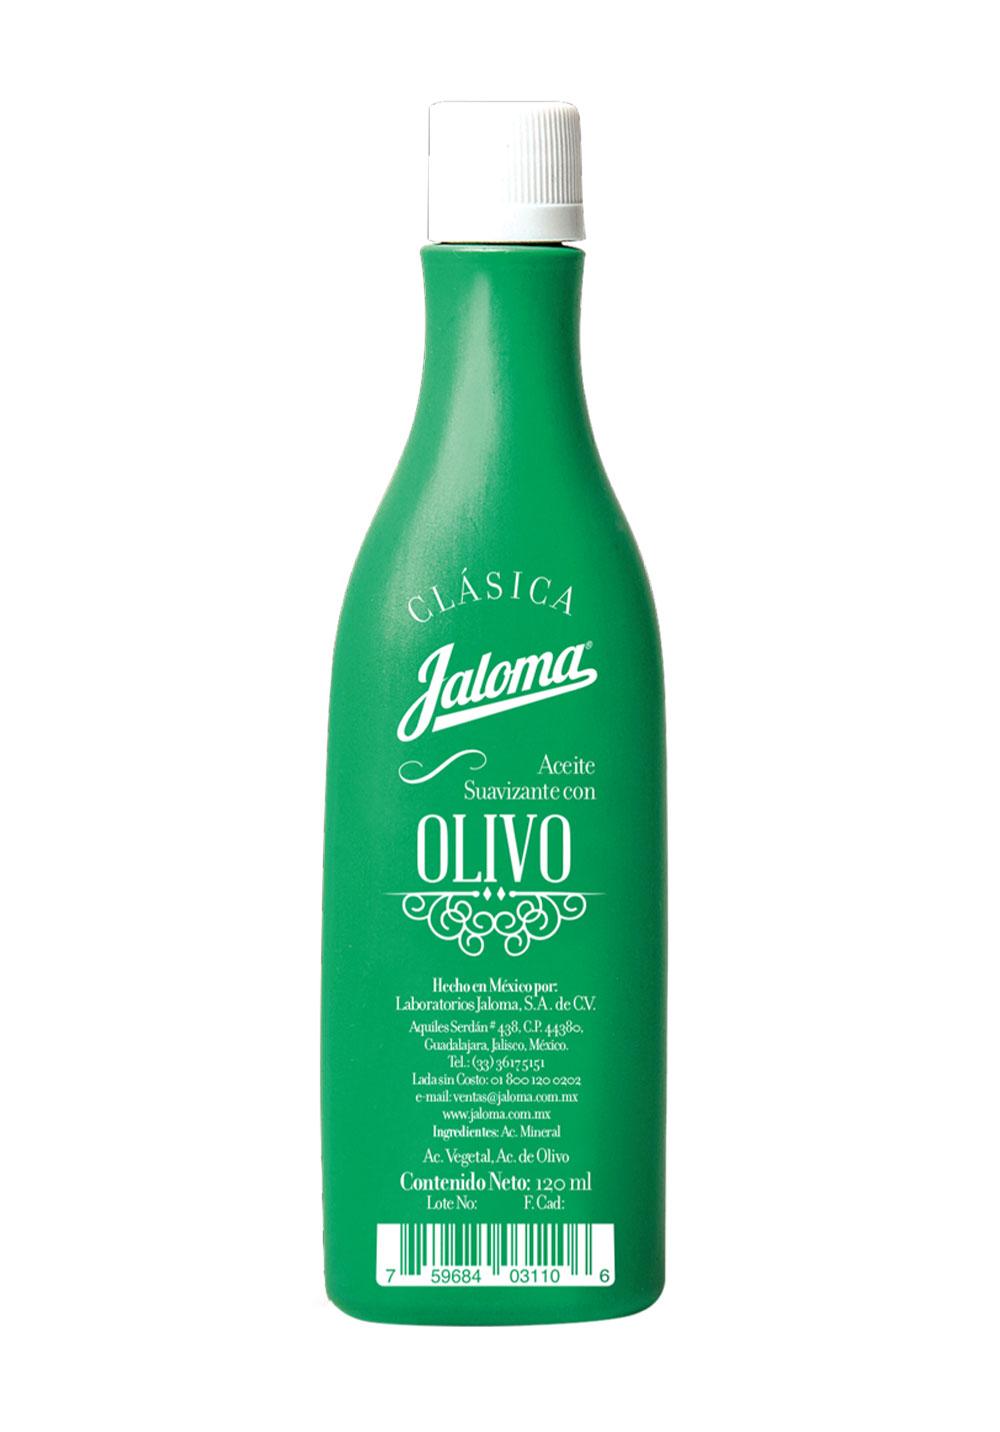 Classic Olive Oil, Net 4 Fl. Oz.